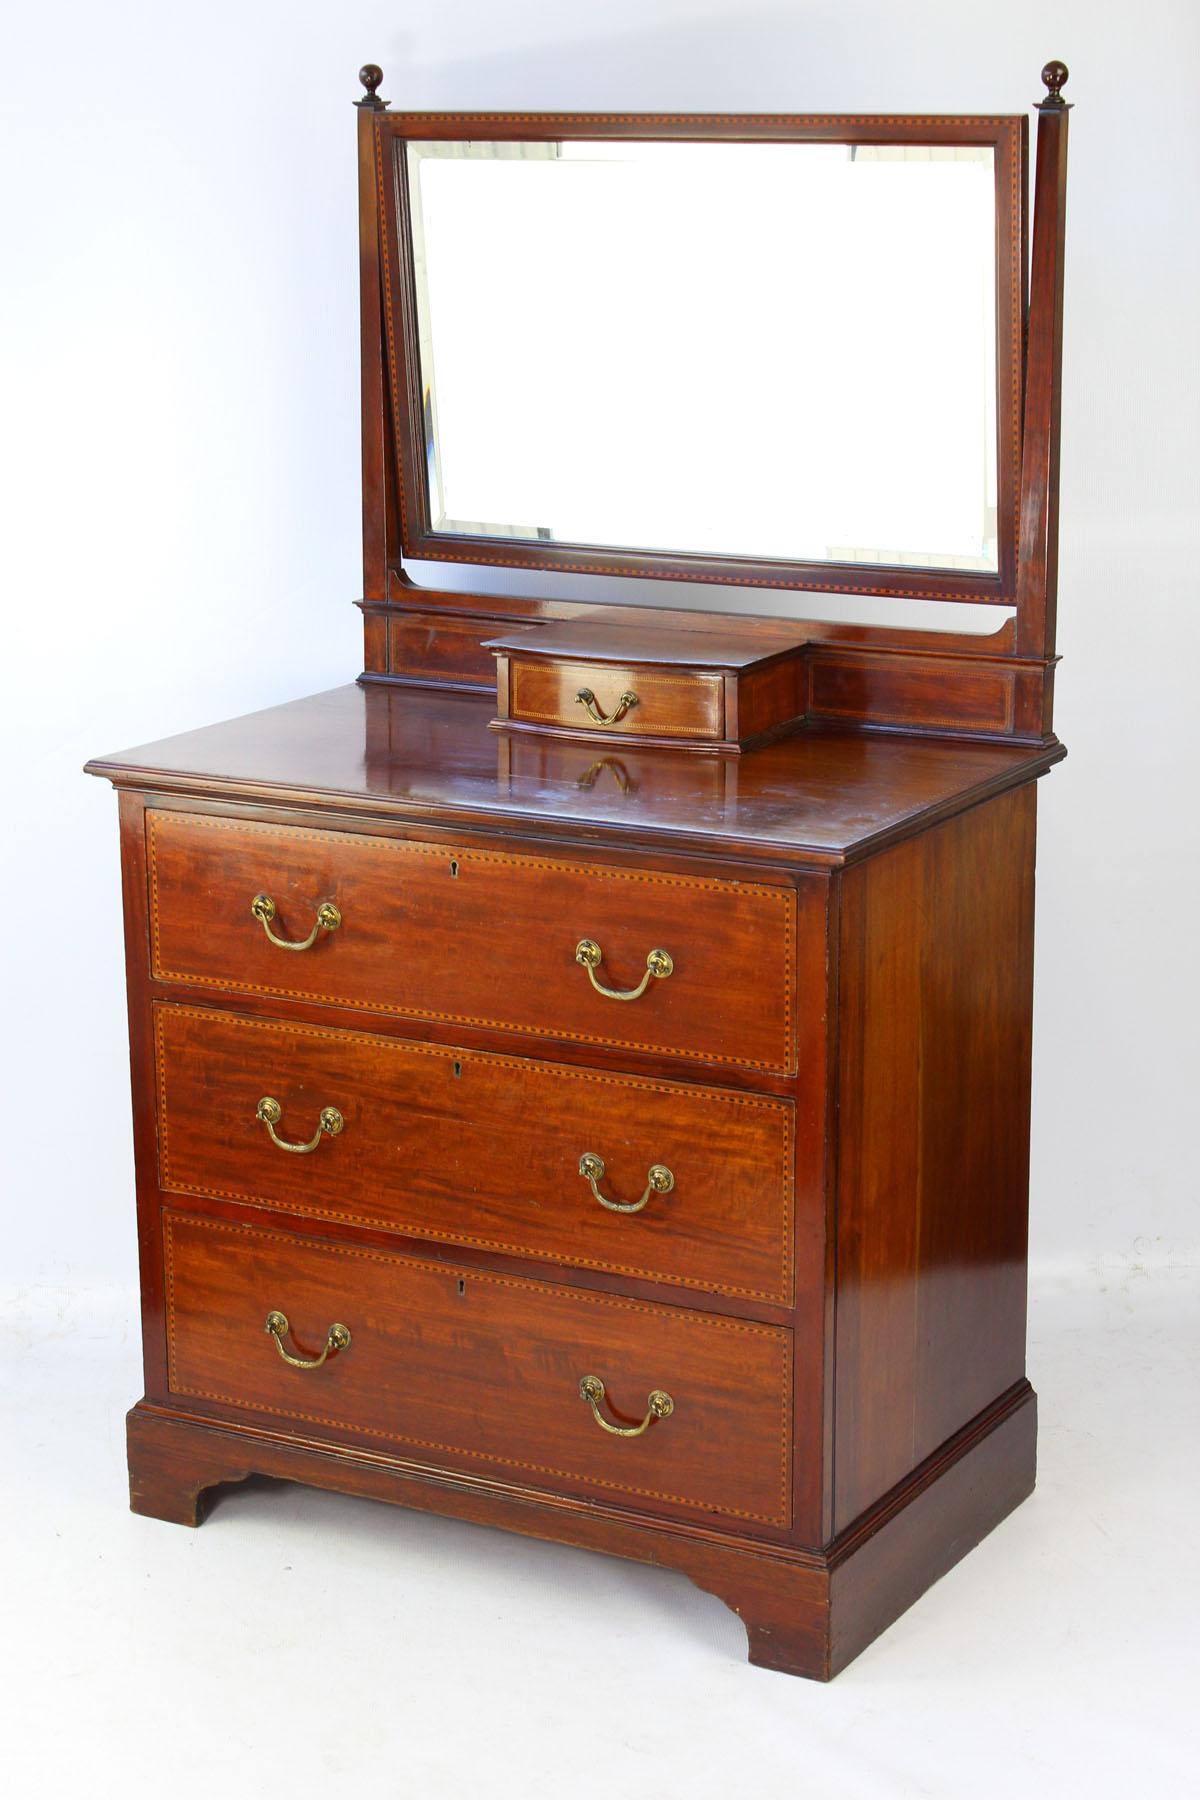 Small Edwardian Mahogany Amp Inlaid Dressing Table